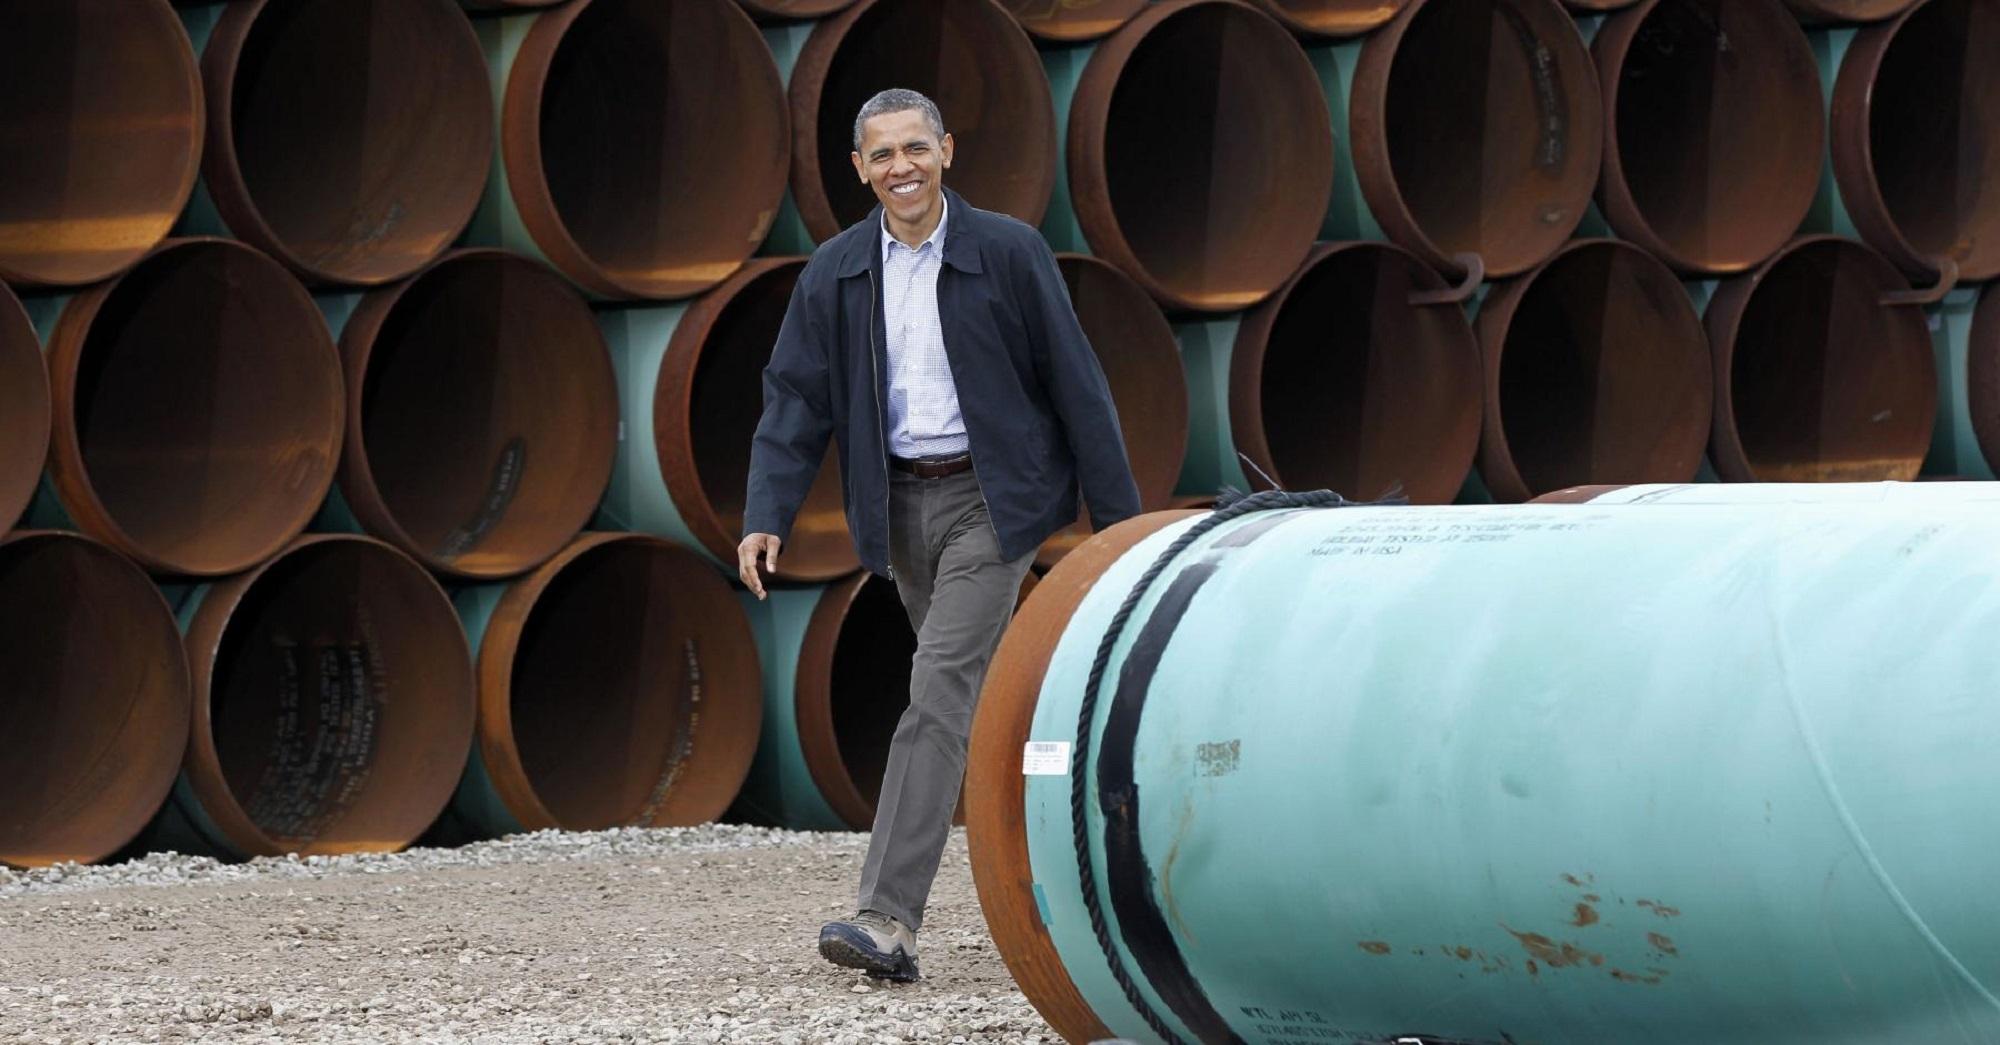 In 2012, President Barack Obama toured the TransCanada Stillwater Pipe Yard in Cushing, Okla. (AP file)